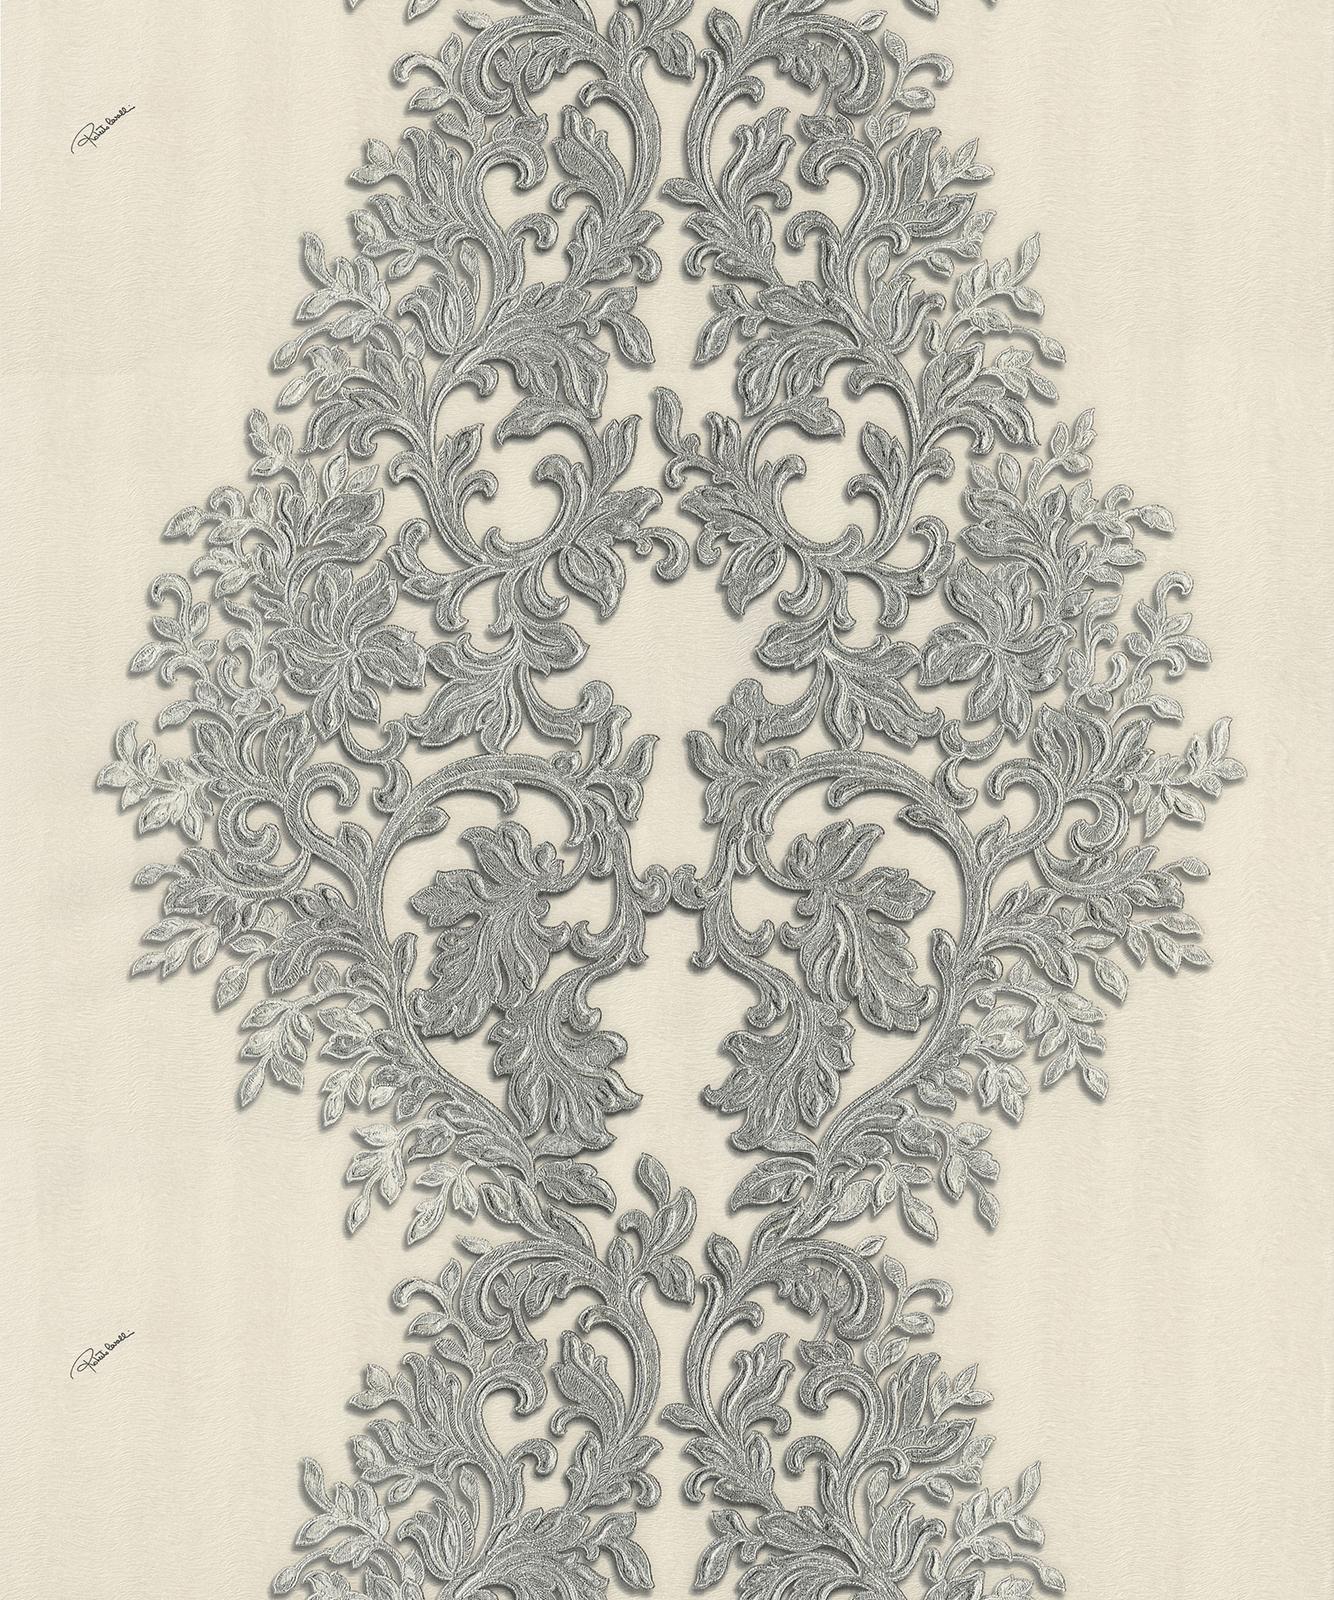 Roberto Cavalli RC13004 Damask Wallpaper Volume 2 Fashion 1334x1600